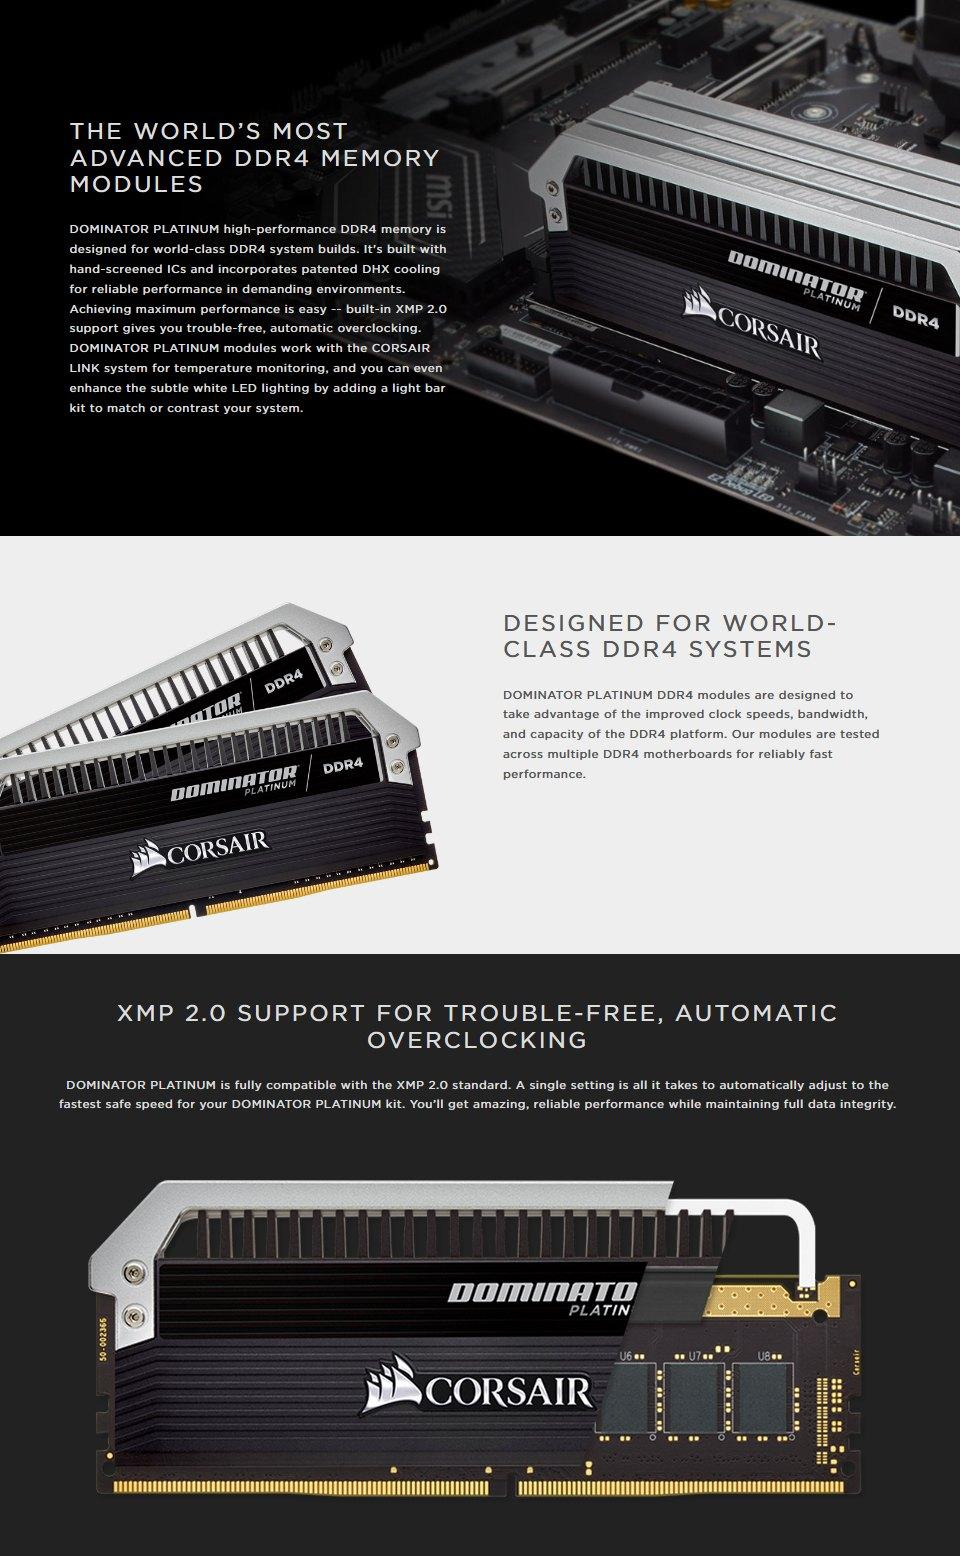 Corsair Dominator Platinum 64GB (4x16GB) 3200Mhz CL16 DDR4 features